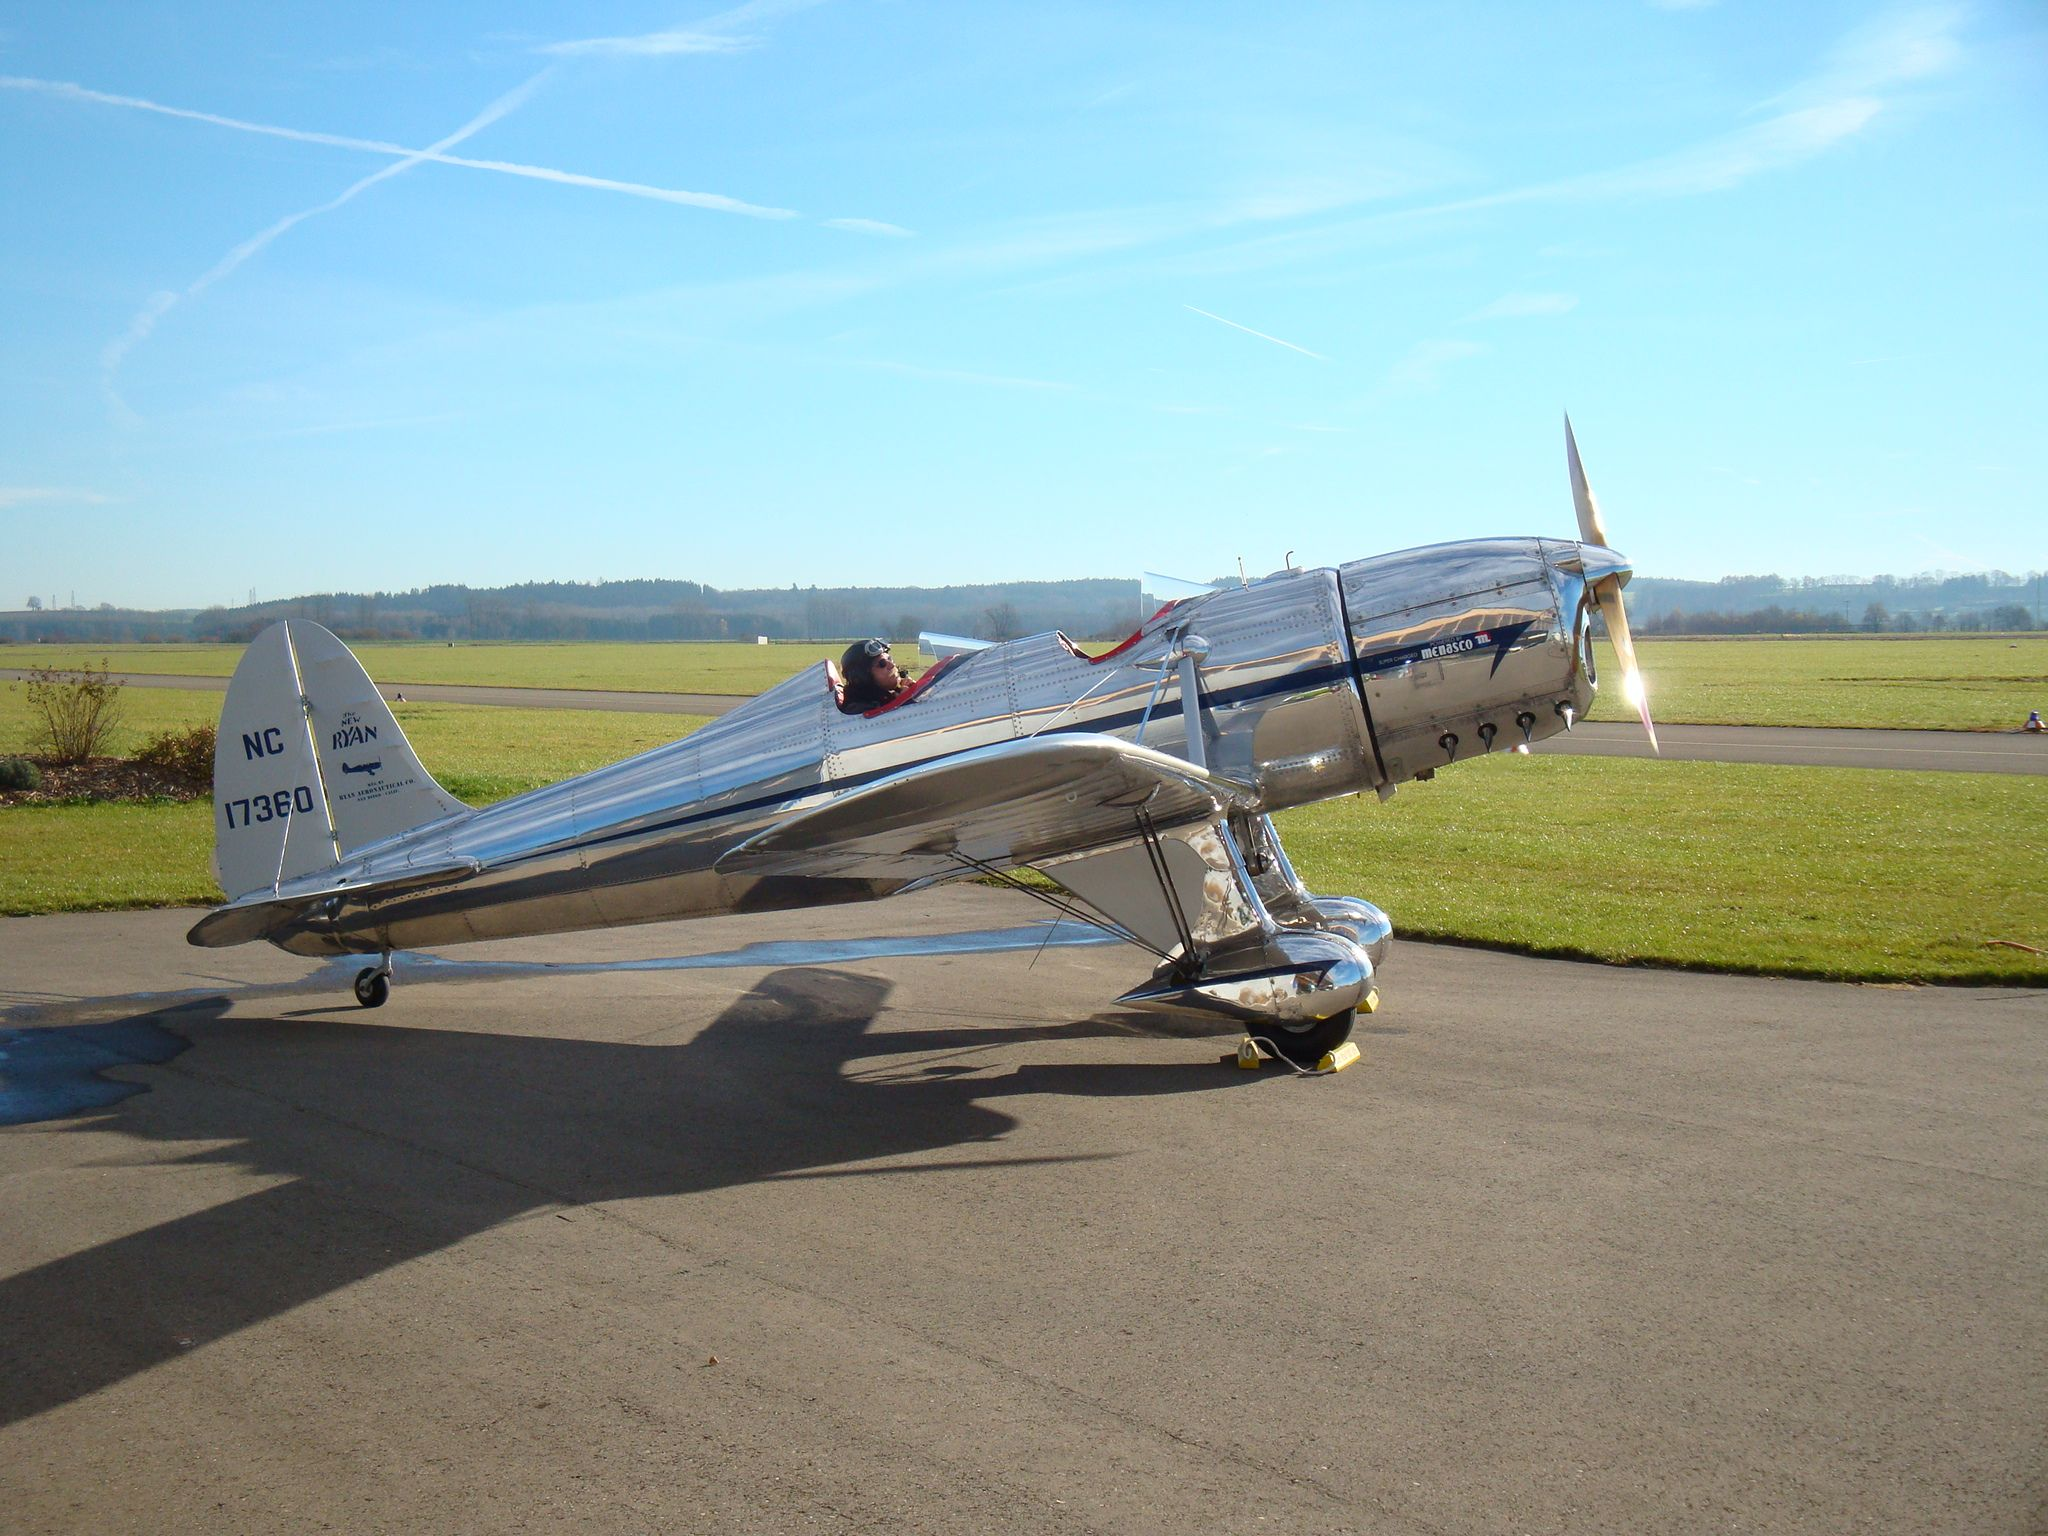 Google Image Result for http://www.antique-aeroflyers.de/DSC01591.JPG